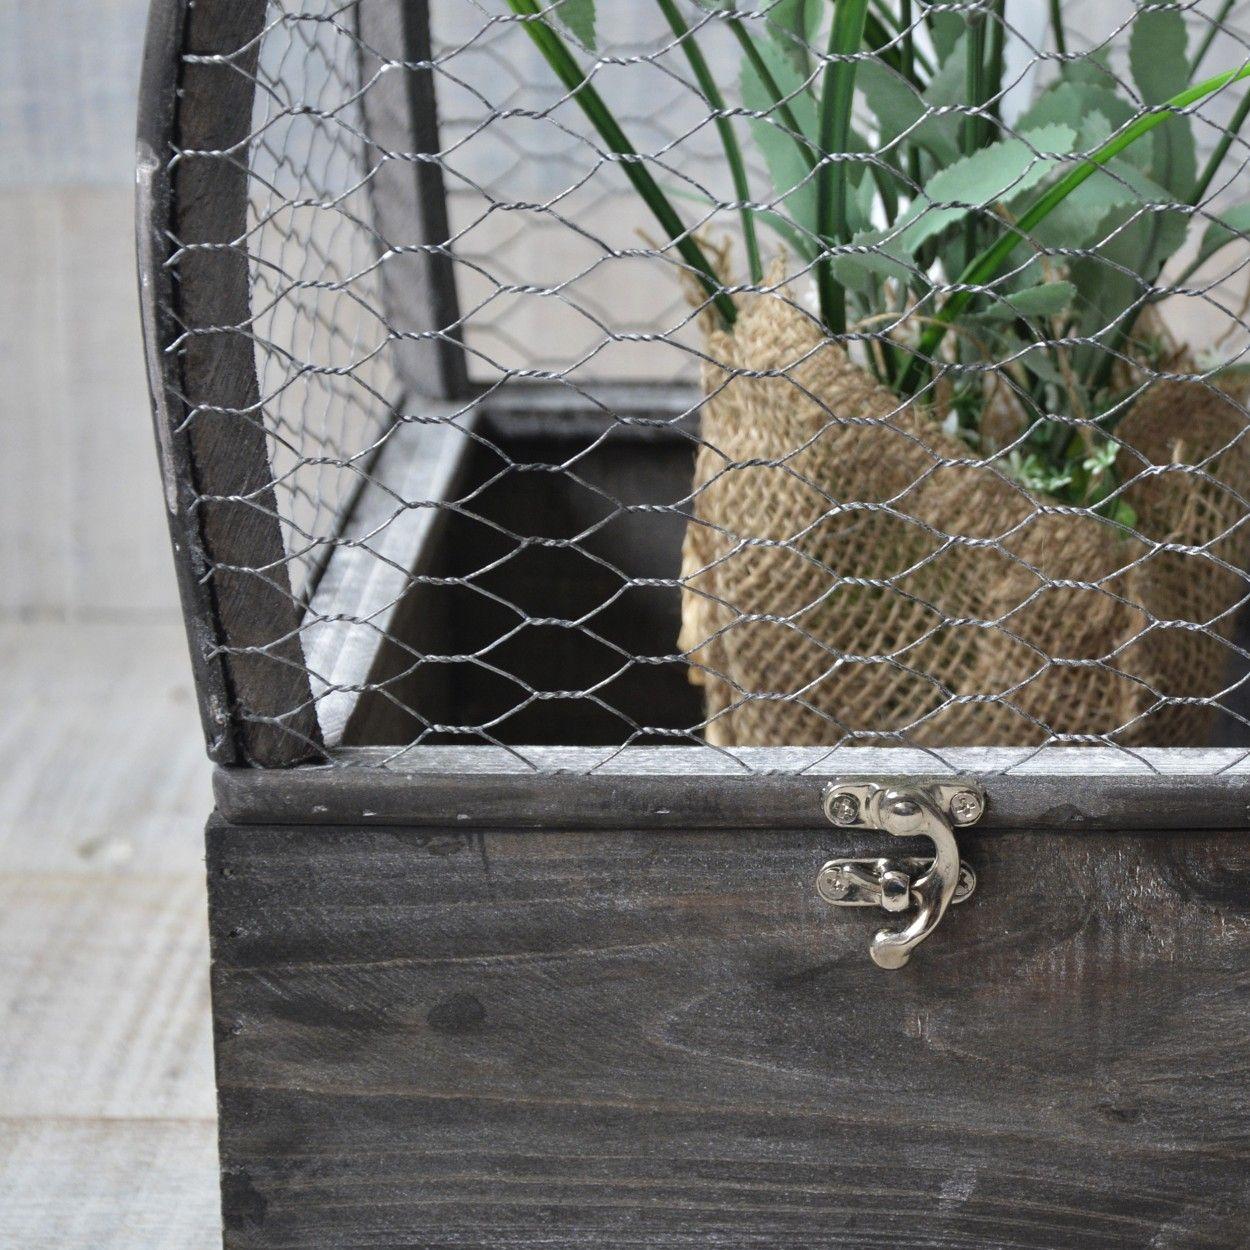 Jaula madera natural original para decoraci n juego hogar - Decoracion hogar original ...